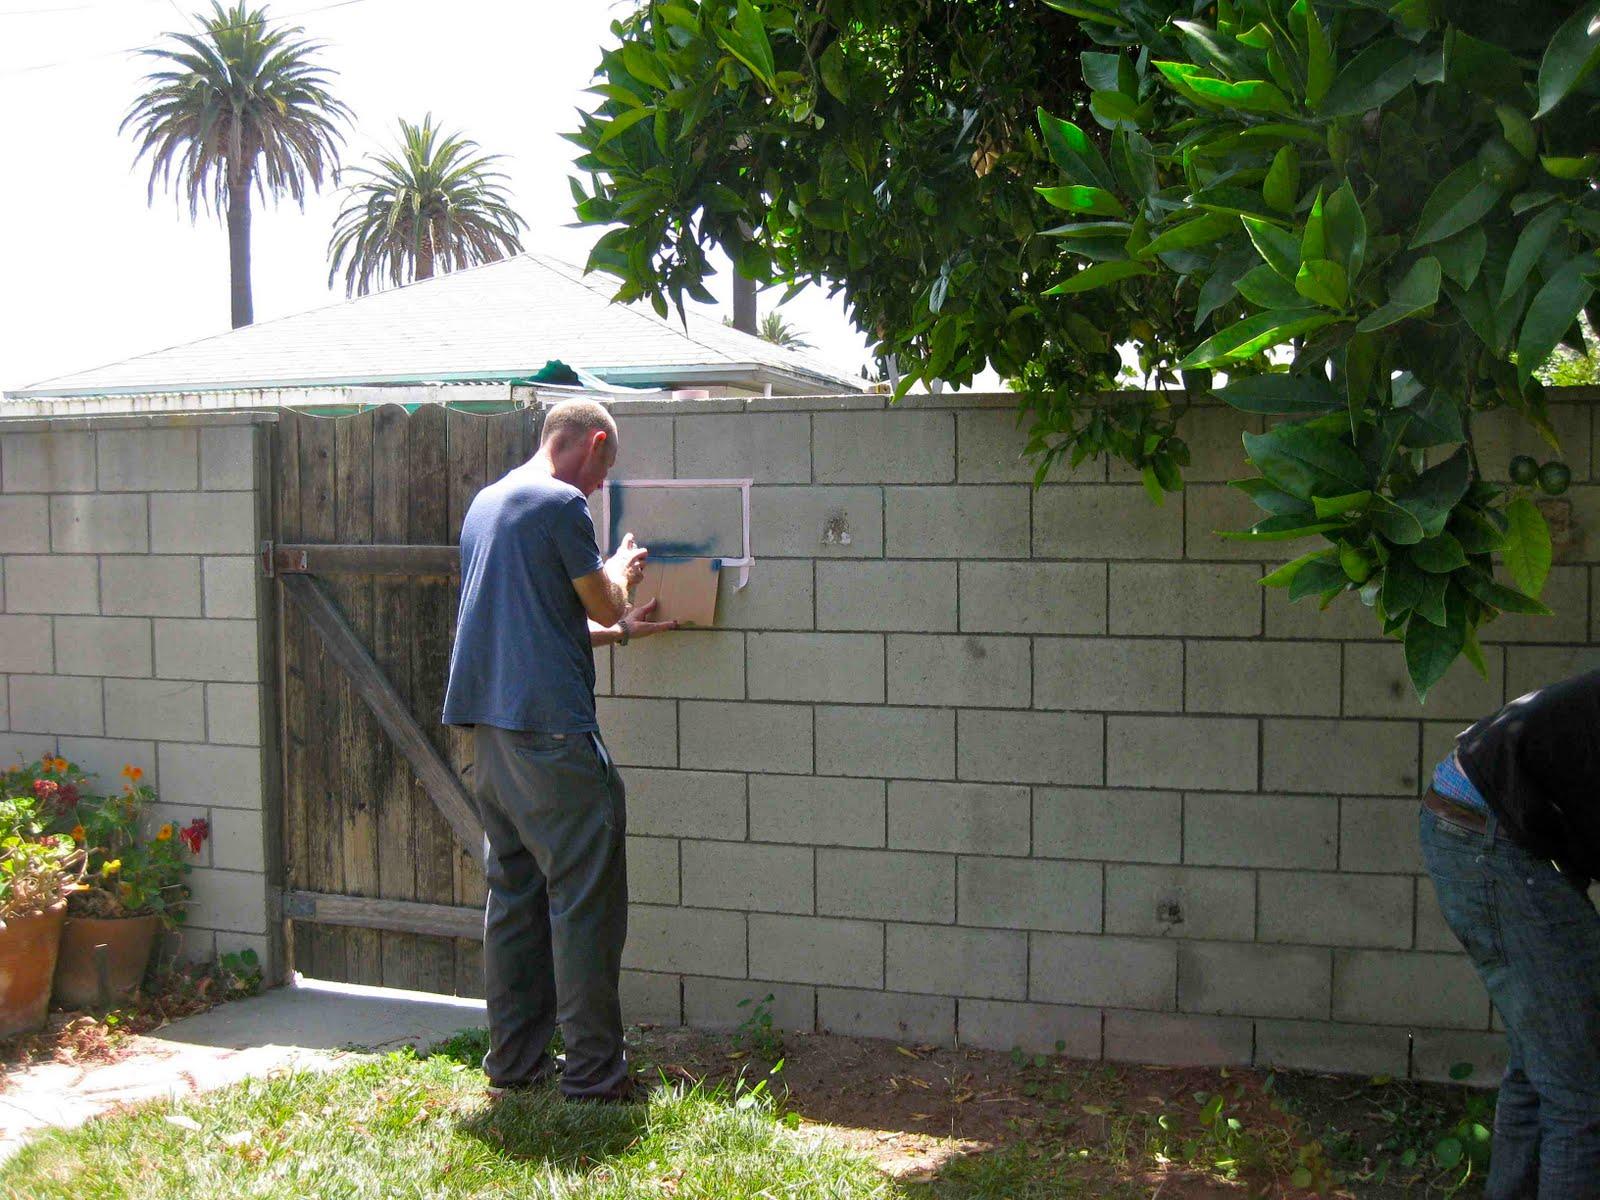 a lovely little life: June 2010 on Backyard Cinder Block Wall Ideas  id=19575